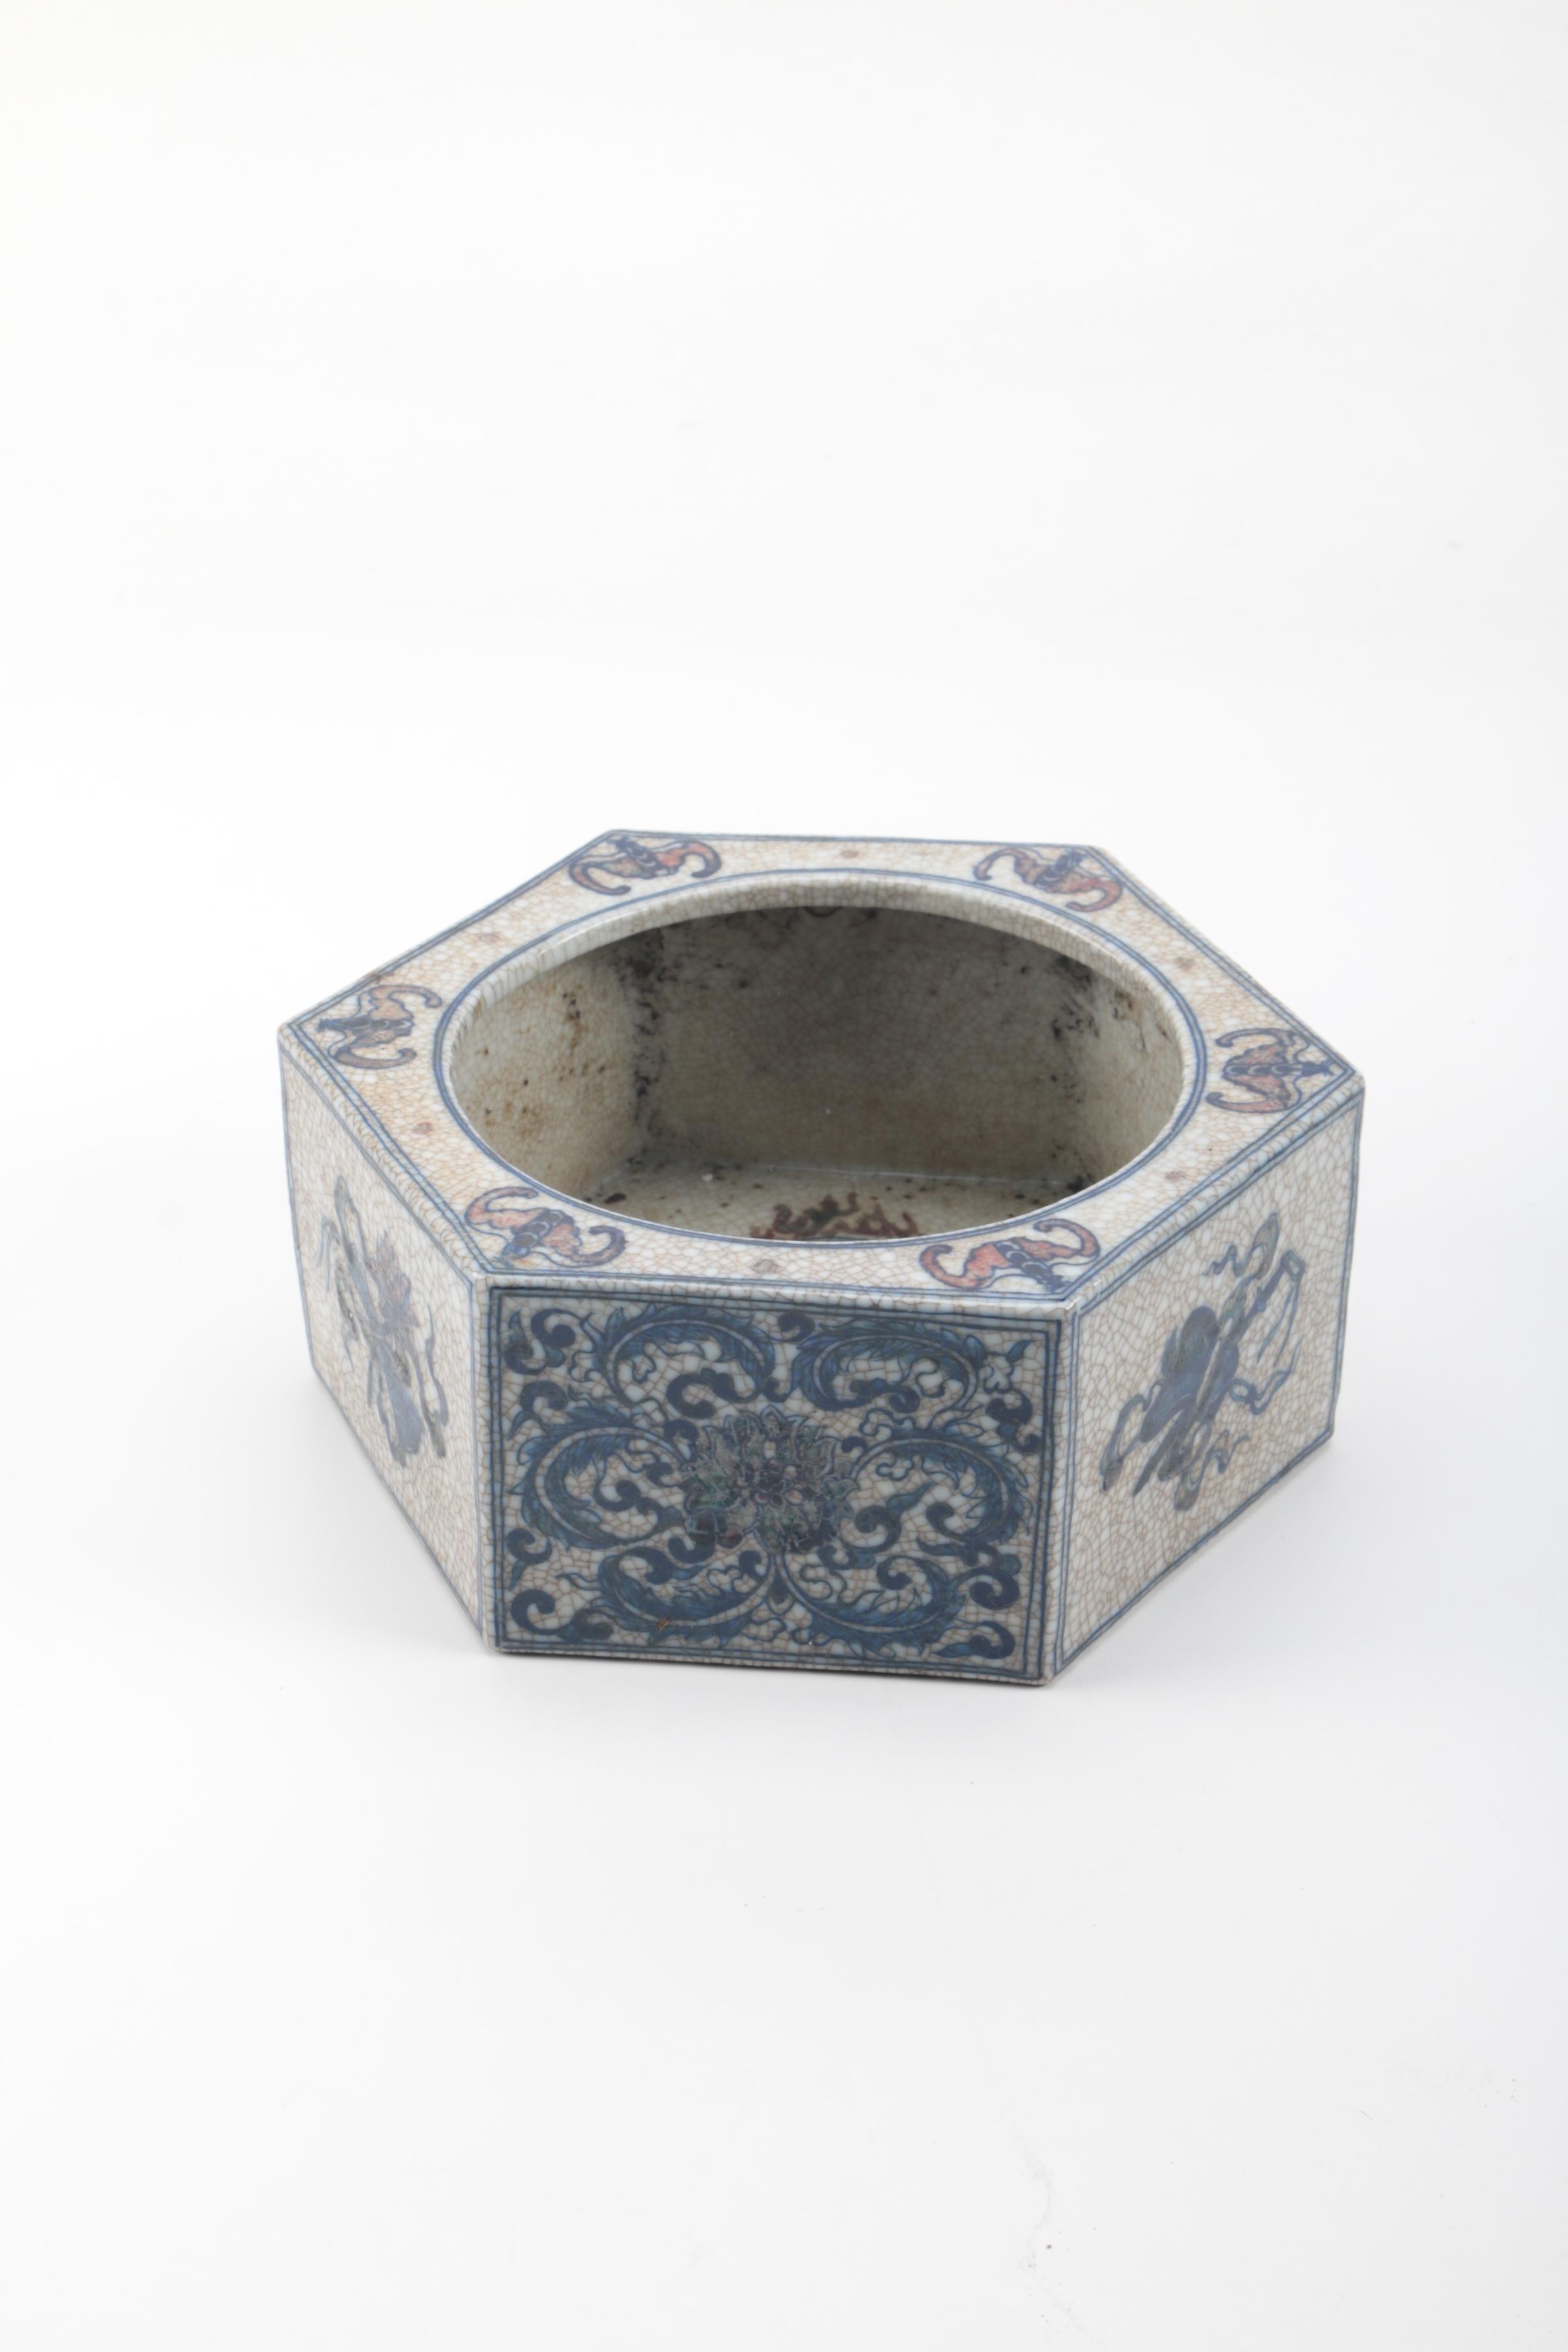 Chinese Hexagonal Blue And White Ceramic Vessel Ebth